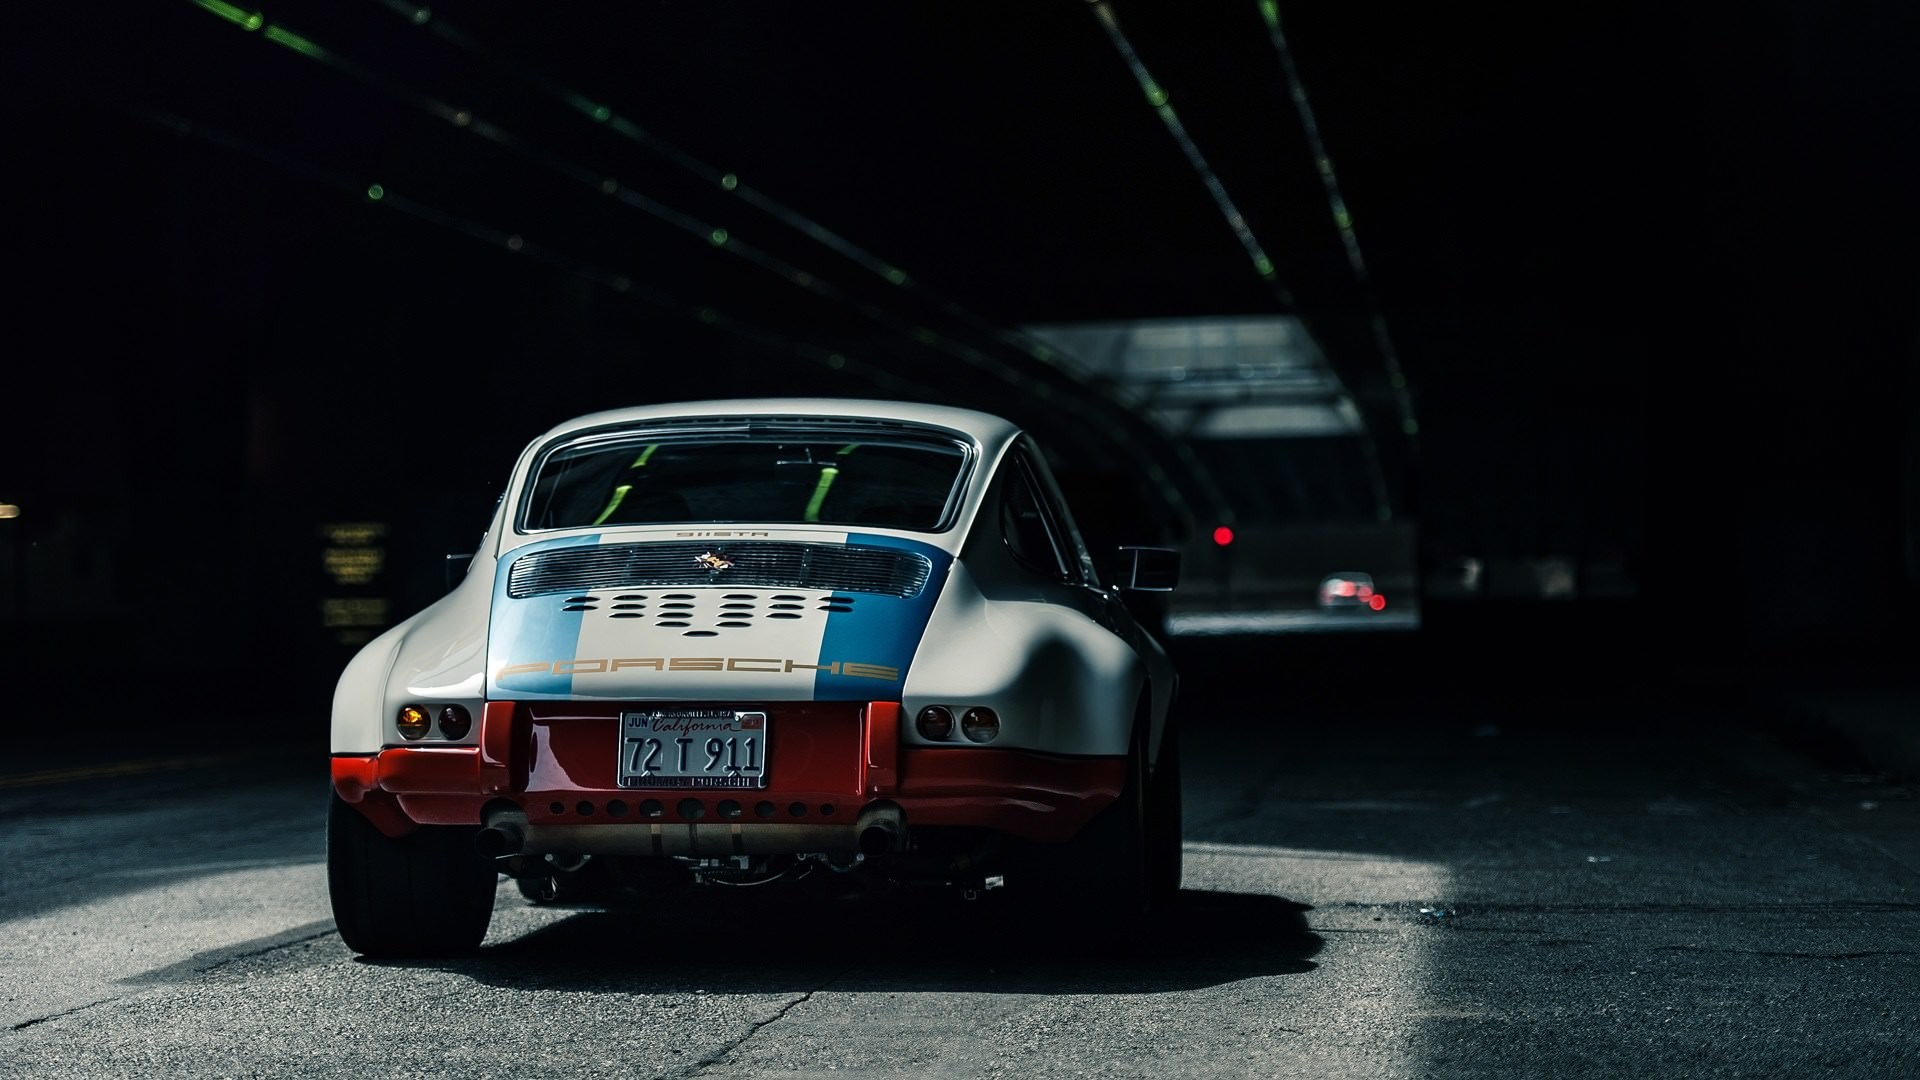 Porsche 911 Wallpaper (84+ pictures)